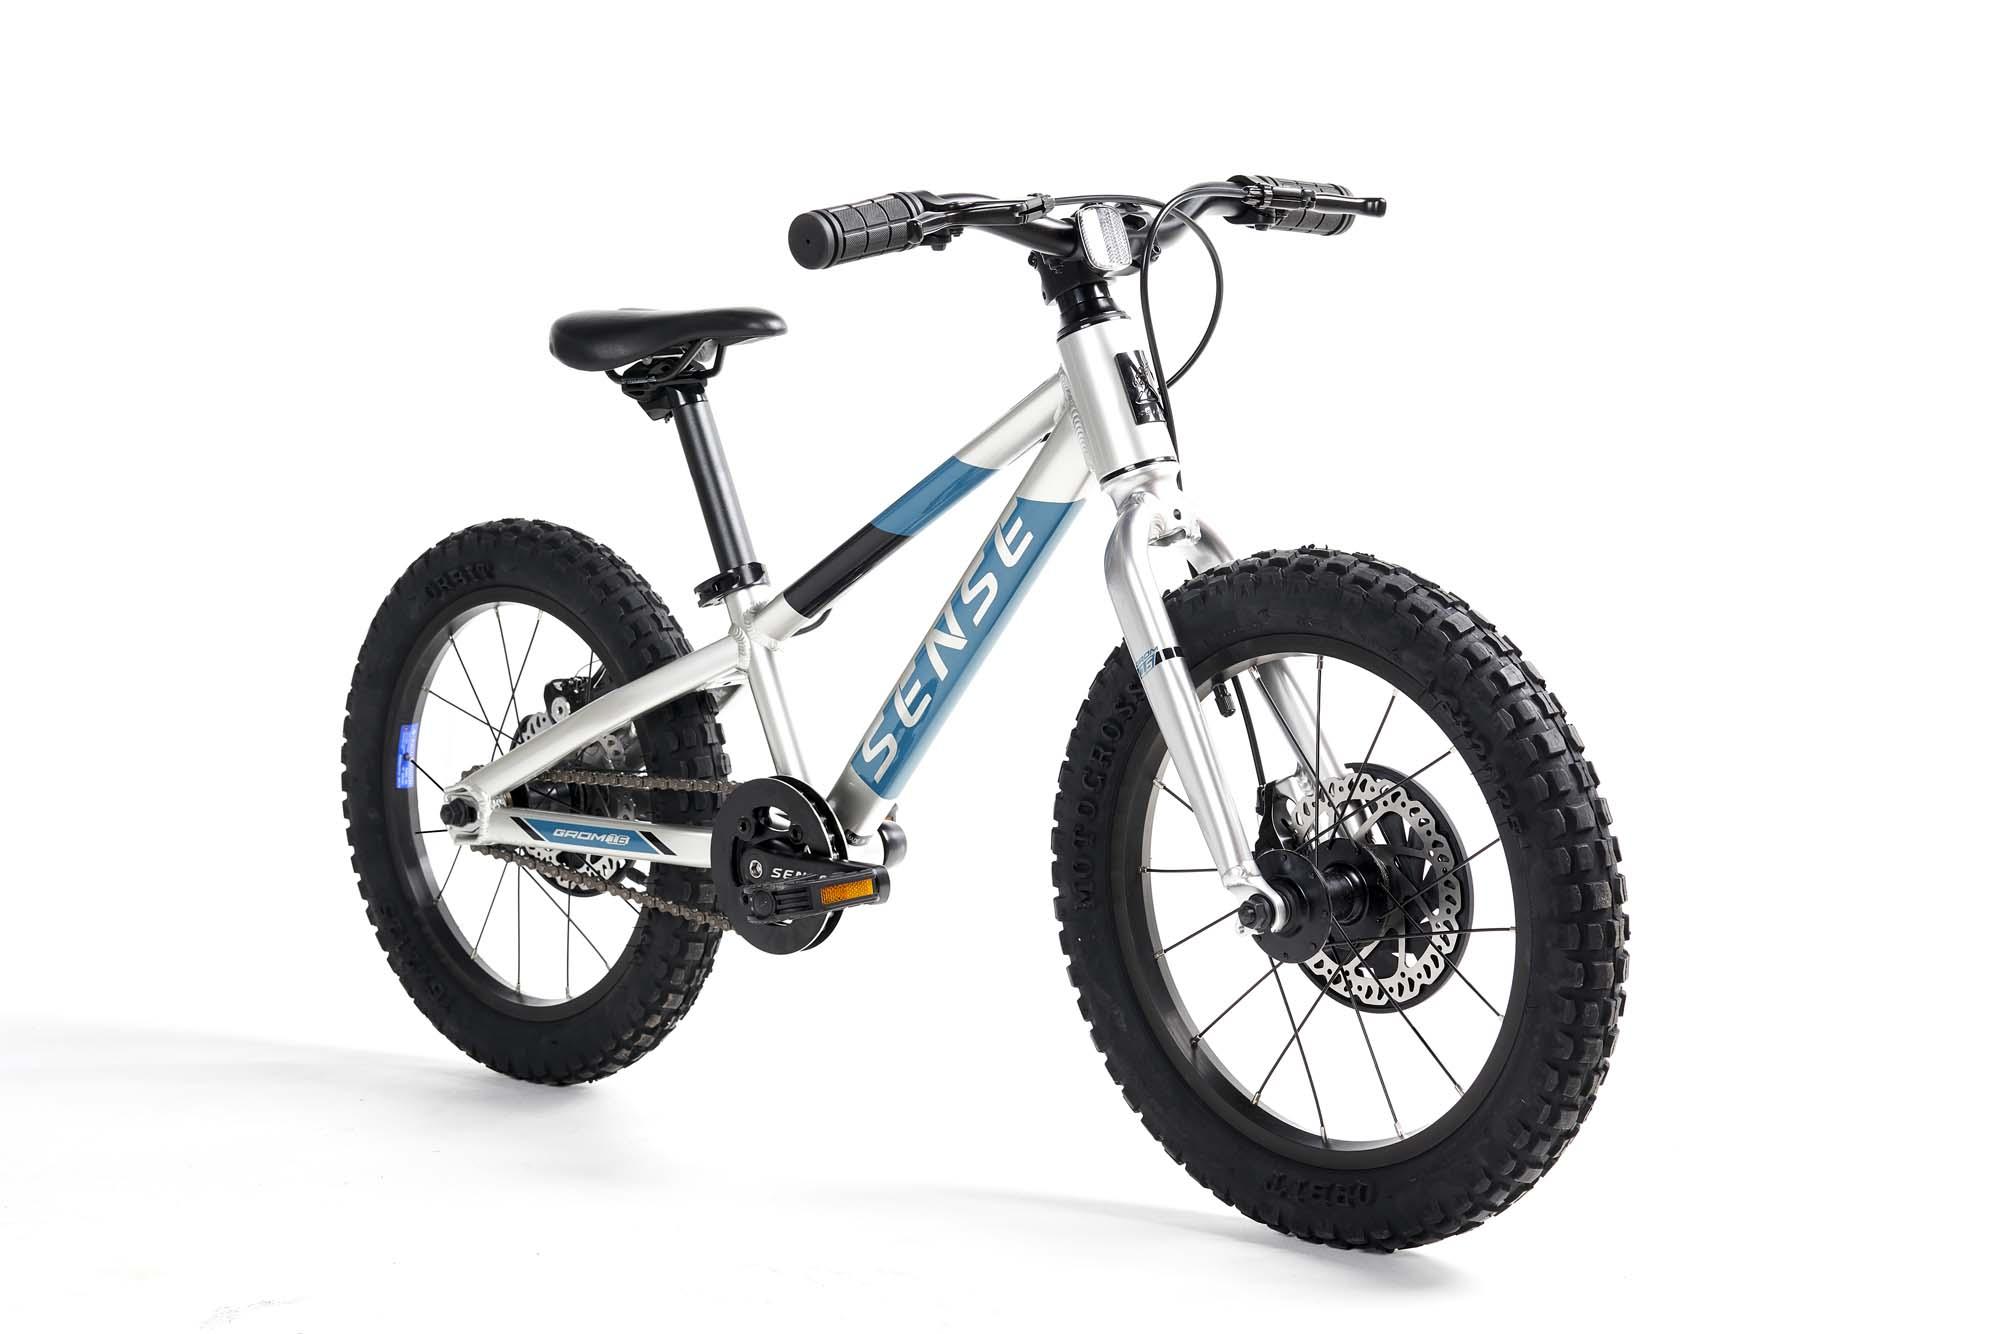 Bicicleta Sense Alum Grom Aro 16 Alum/Aqua